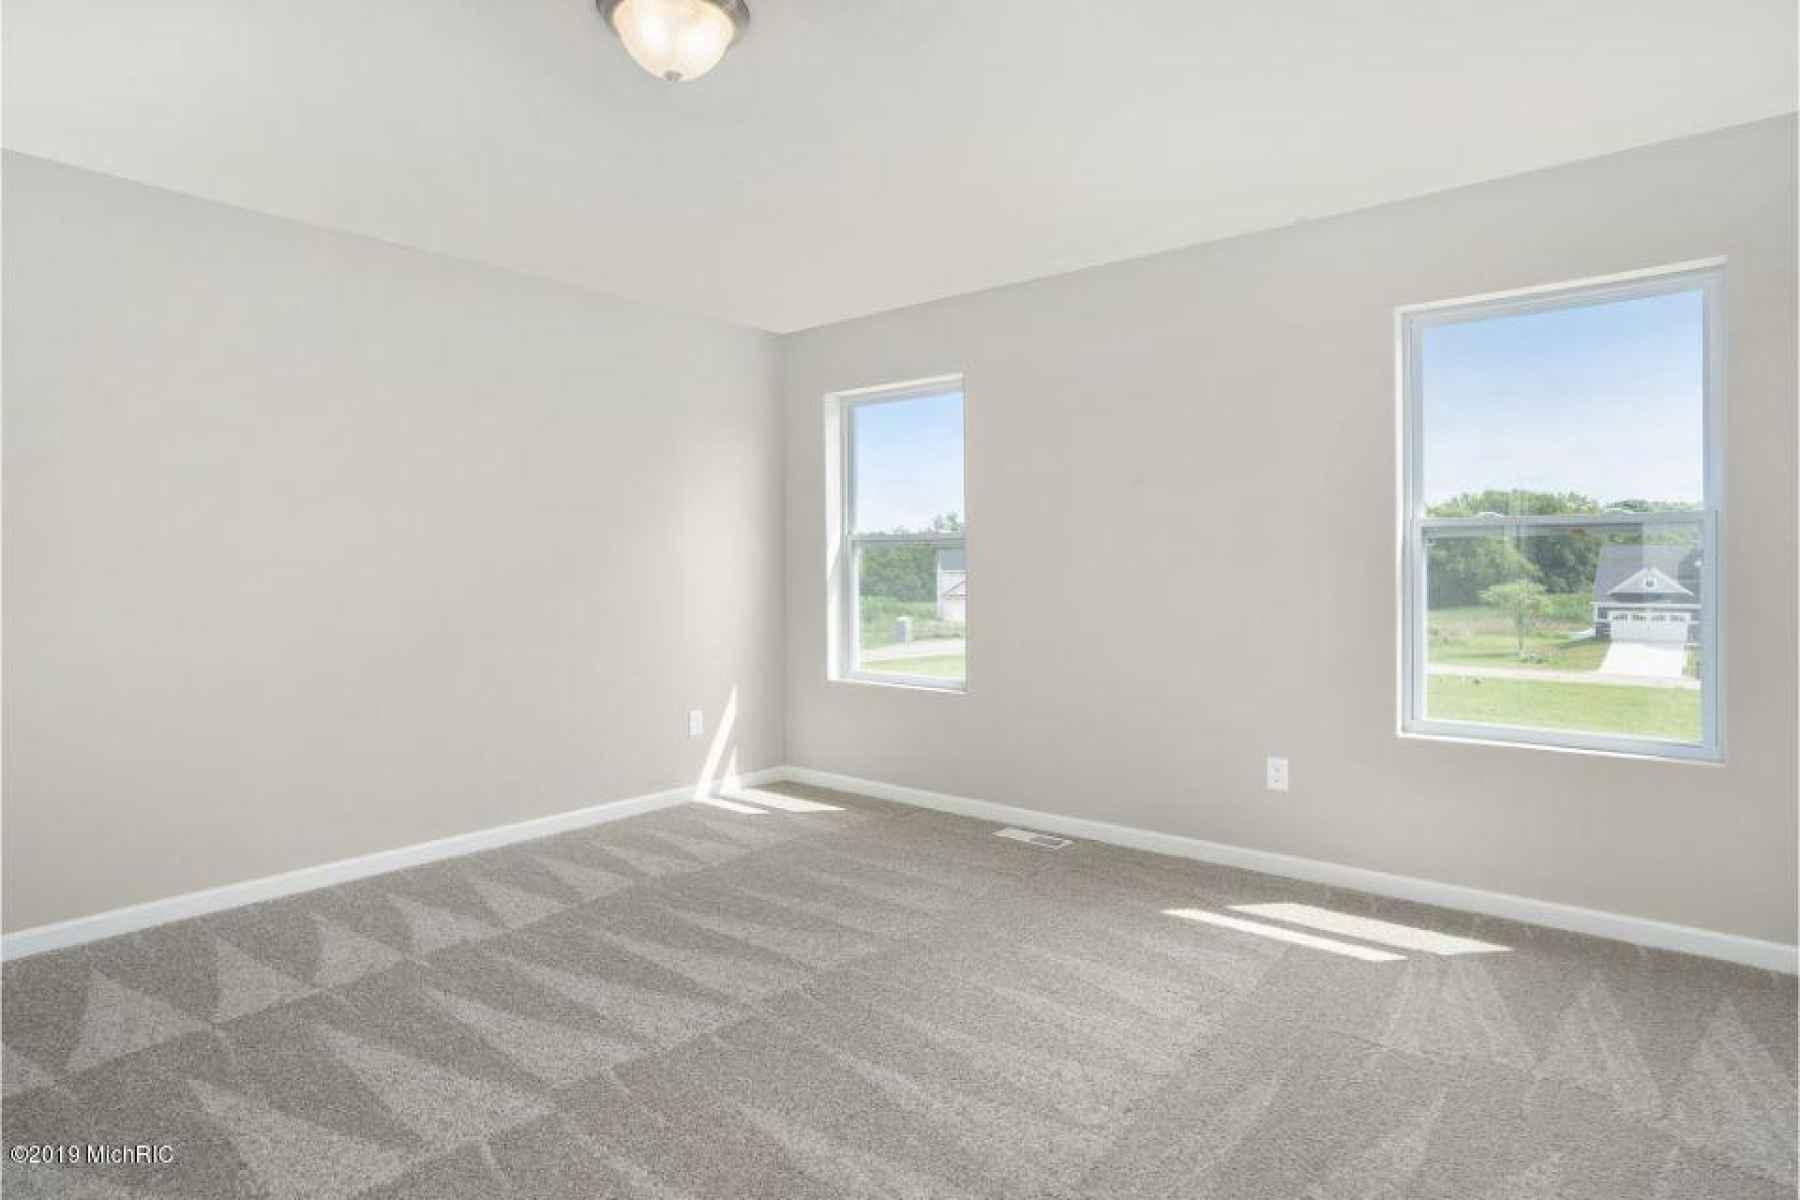 LMD097-E2070-Master Bedroom1